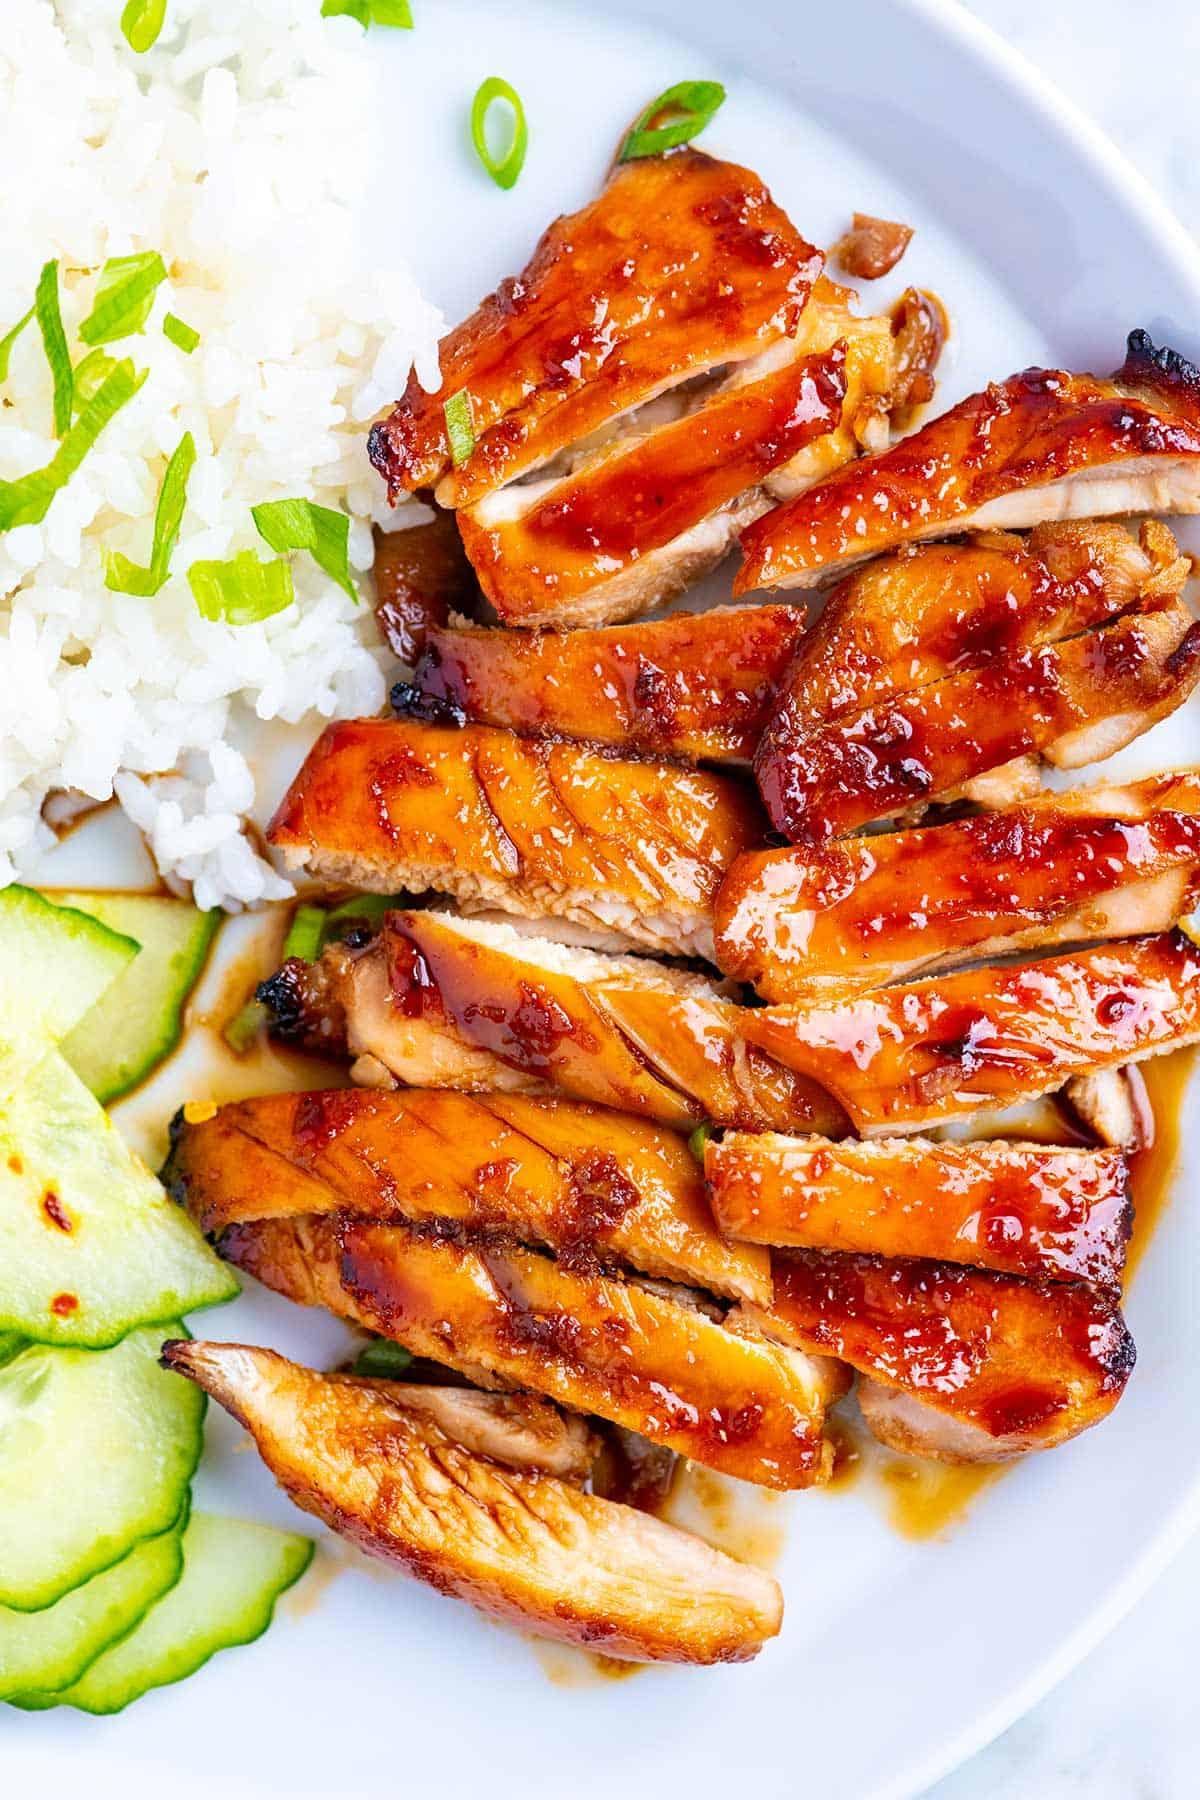 chicken teriyaki recipe easy sauce homemade very cut crave worthy